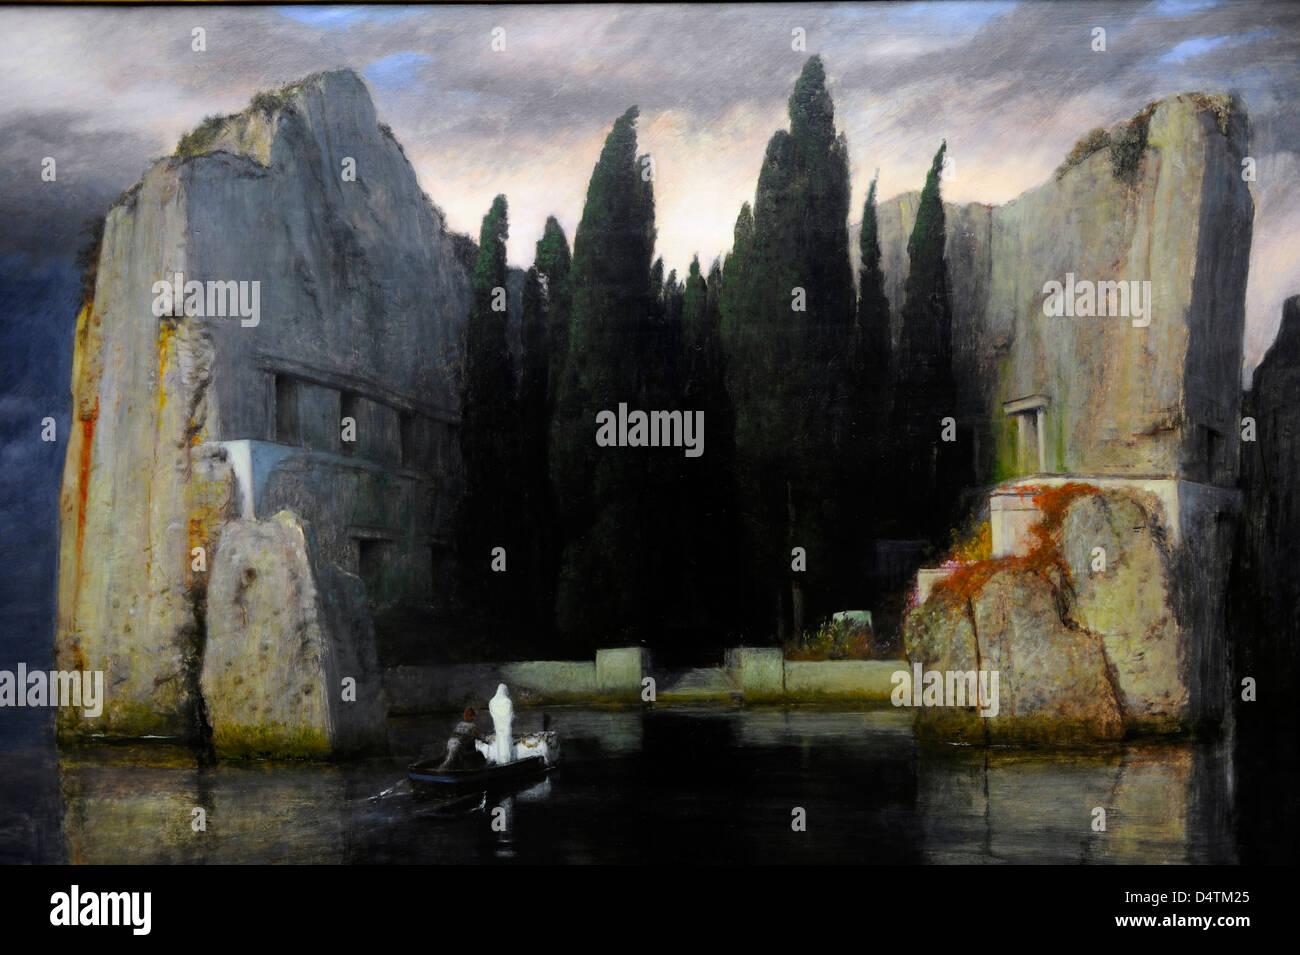 Arnold Böcklin 'Isle of the Dead' 1883 - Stock Image